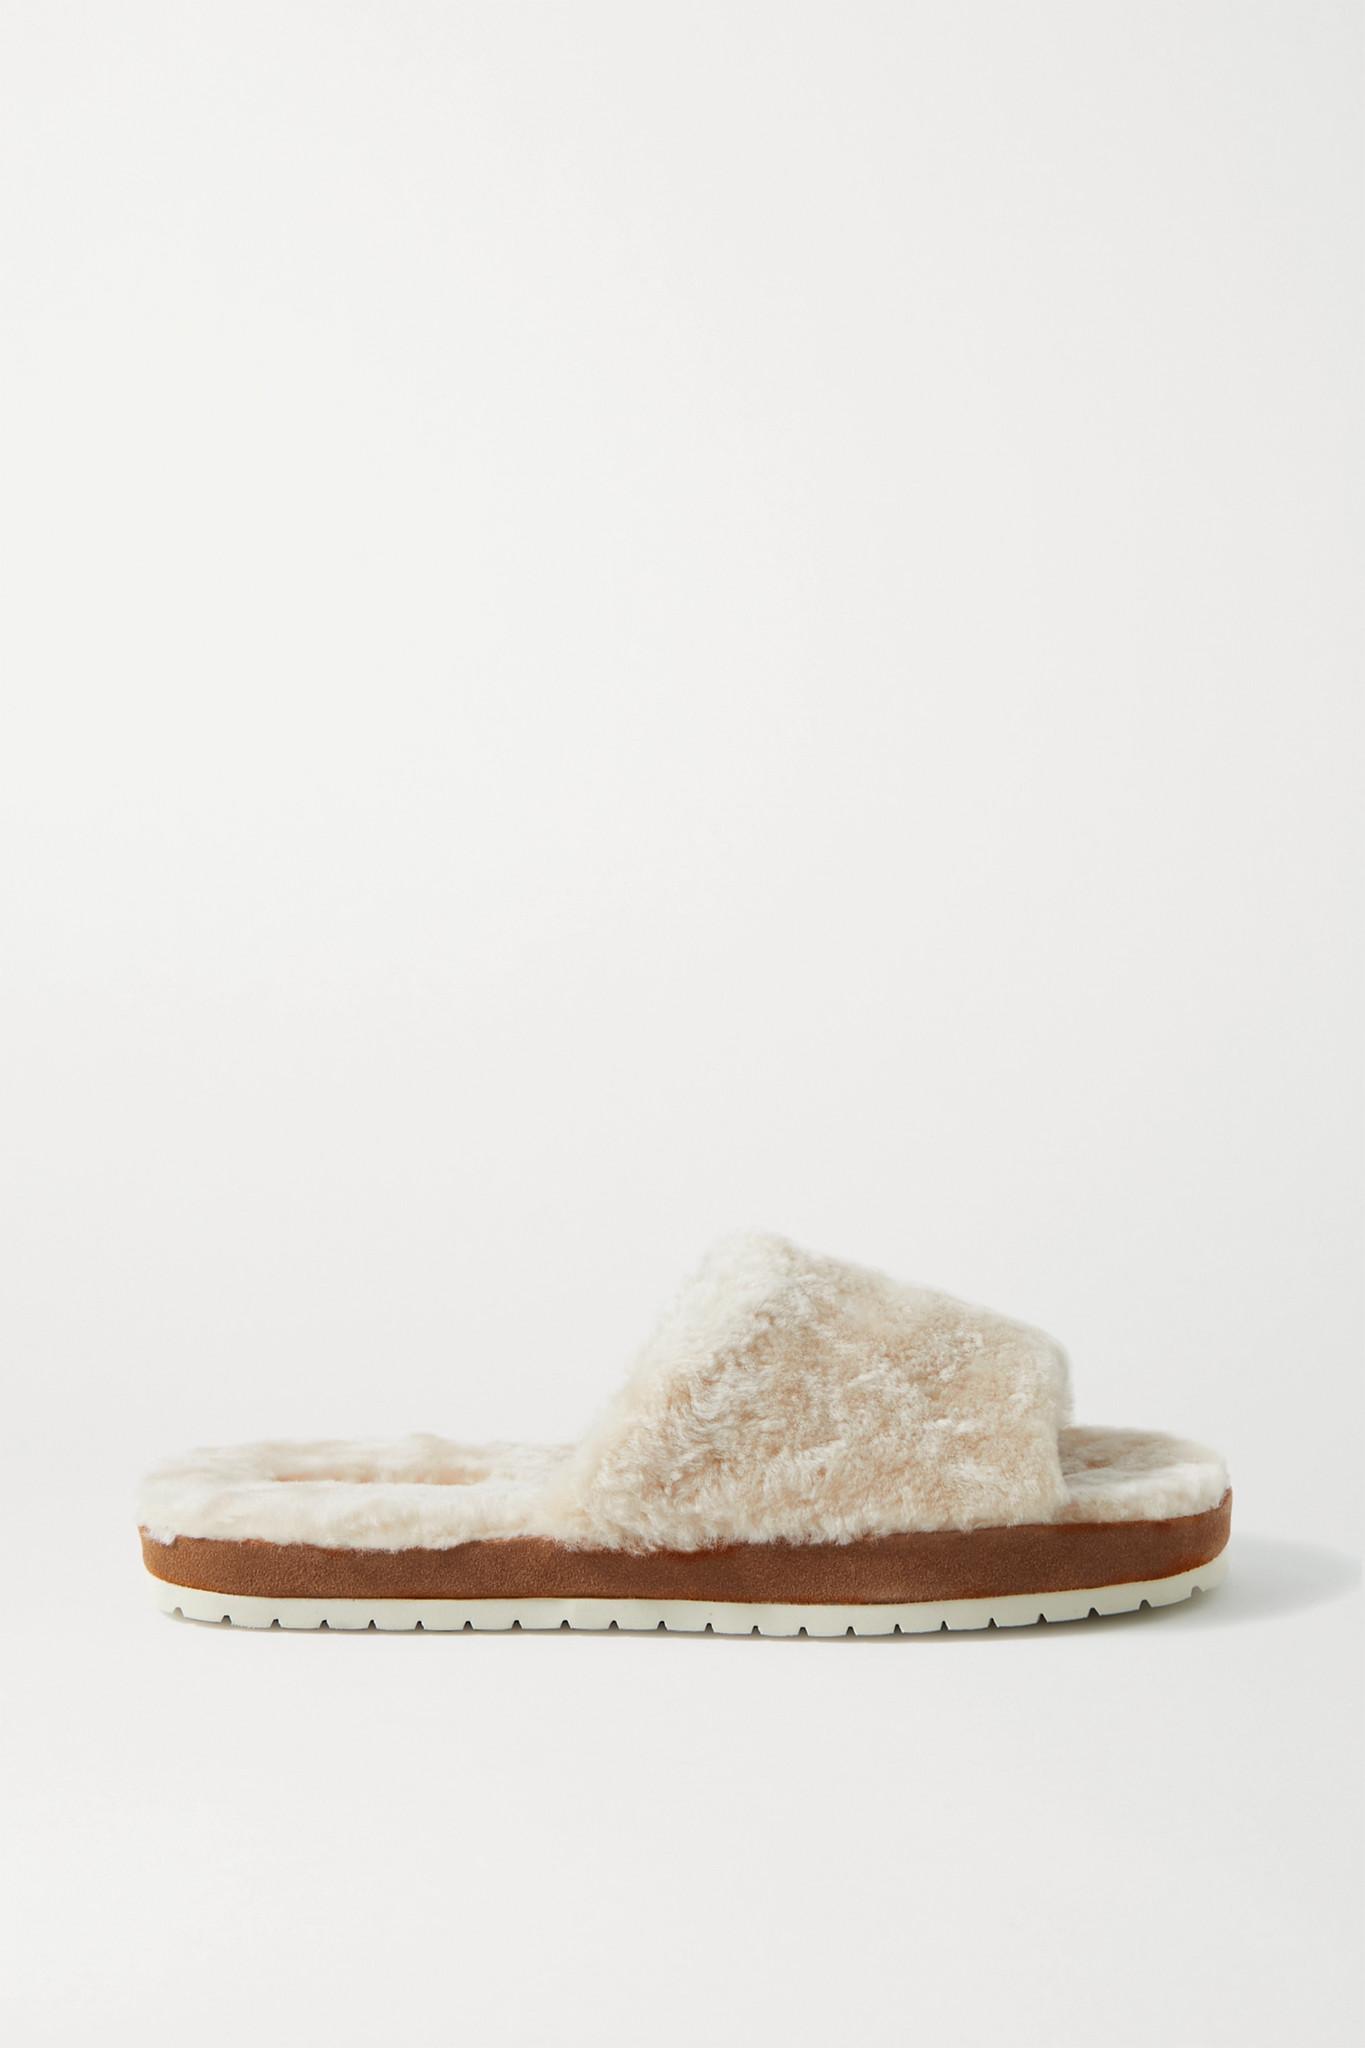 VINCE - Kalina 羊毛皮绒面革拖鞋 - 奶油色 - US9